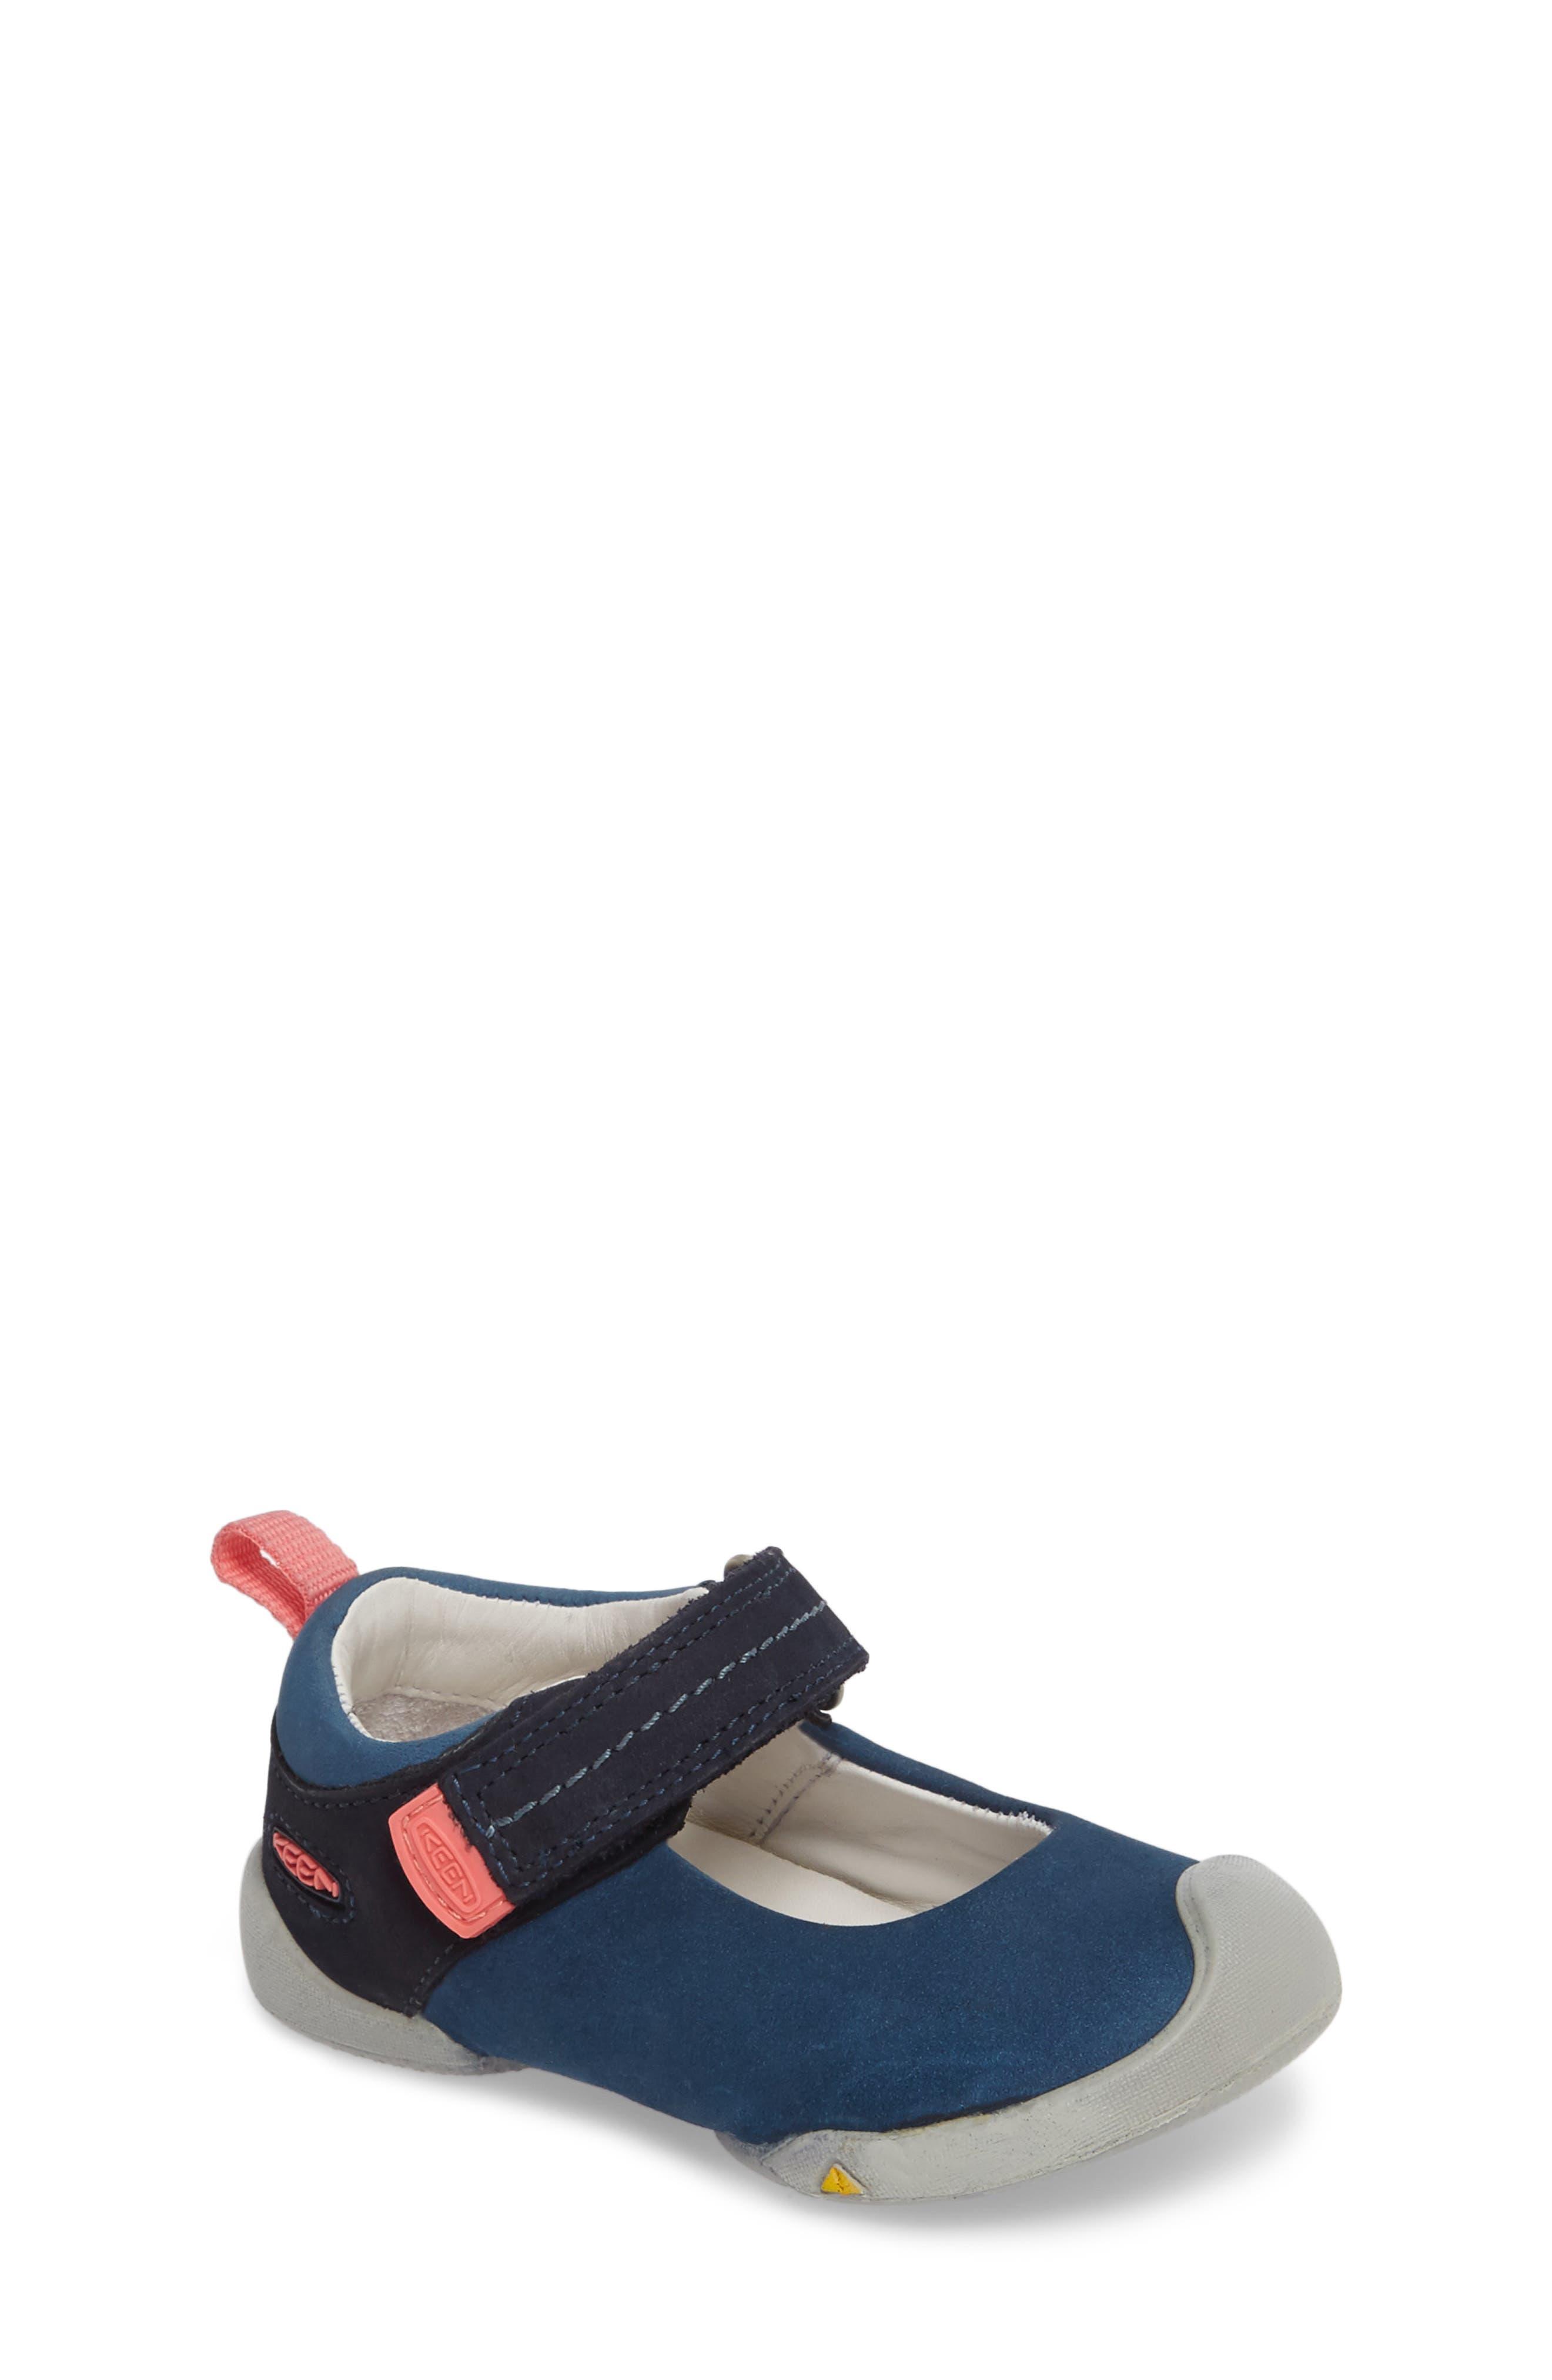 Pep Mary Jane-T Sneaker,                             Main thumbnail 1, color,                             Dress Blues/ Sugar Coral